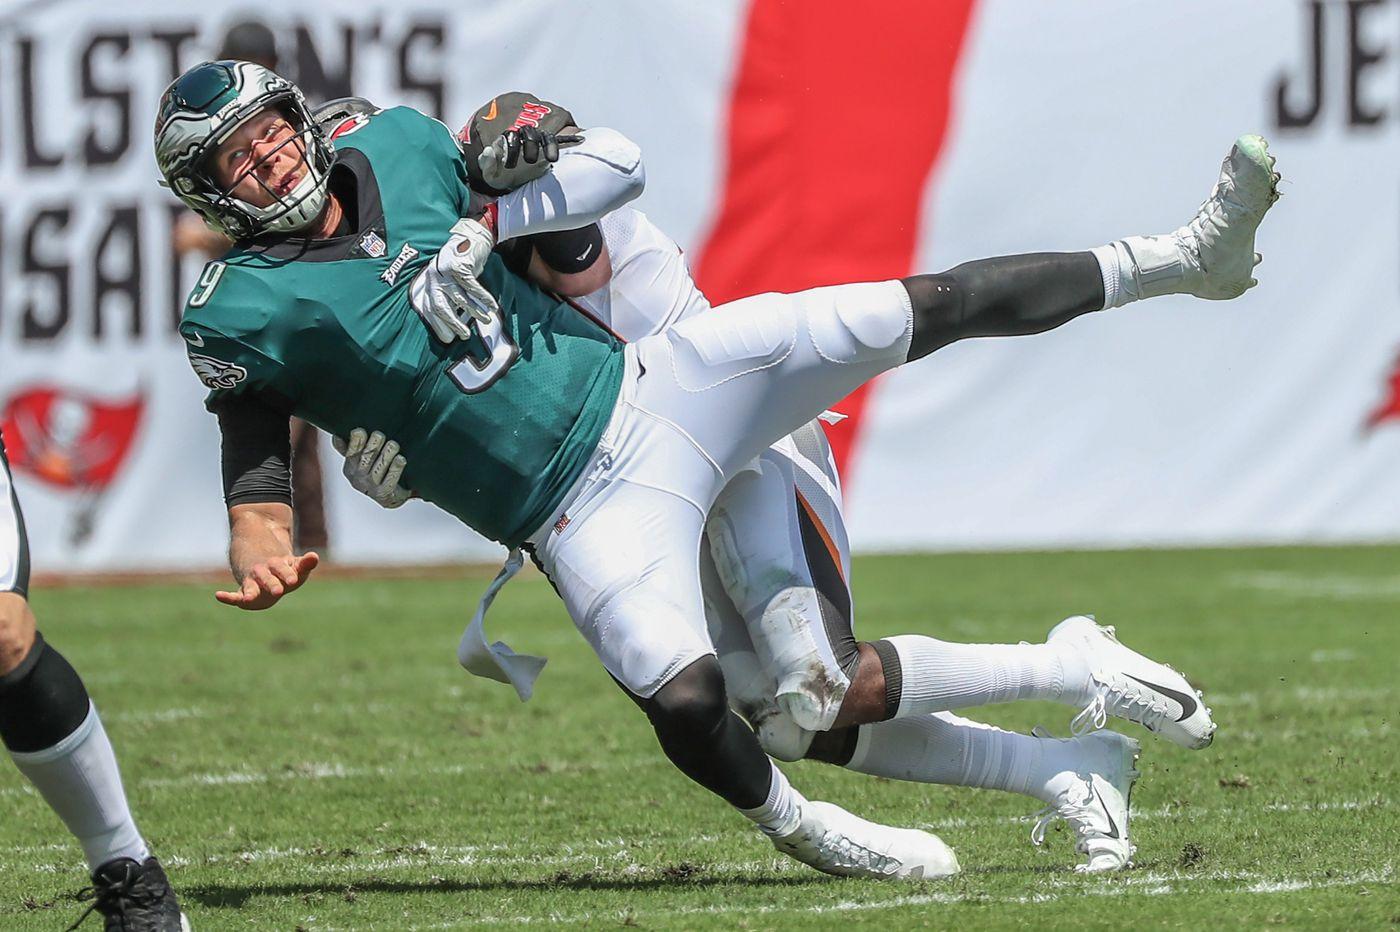 Buccaneers 27, Eagles 21: Ryan Fitzpatrick, DeSean Jackson use big plays to haunt team marred by injuries